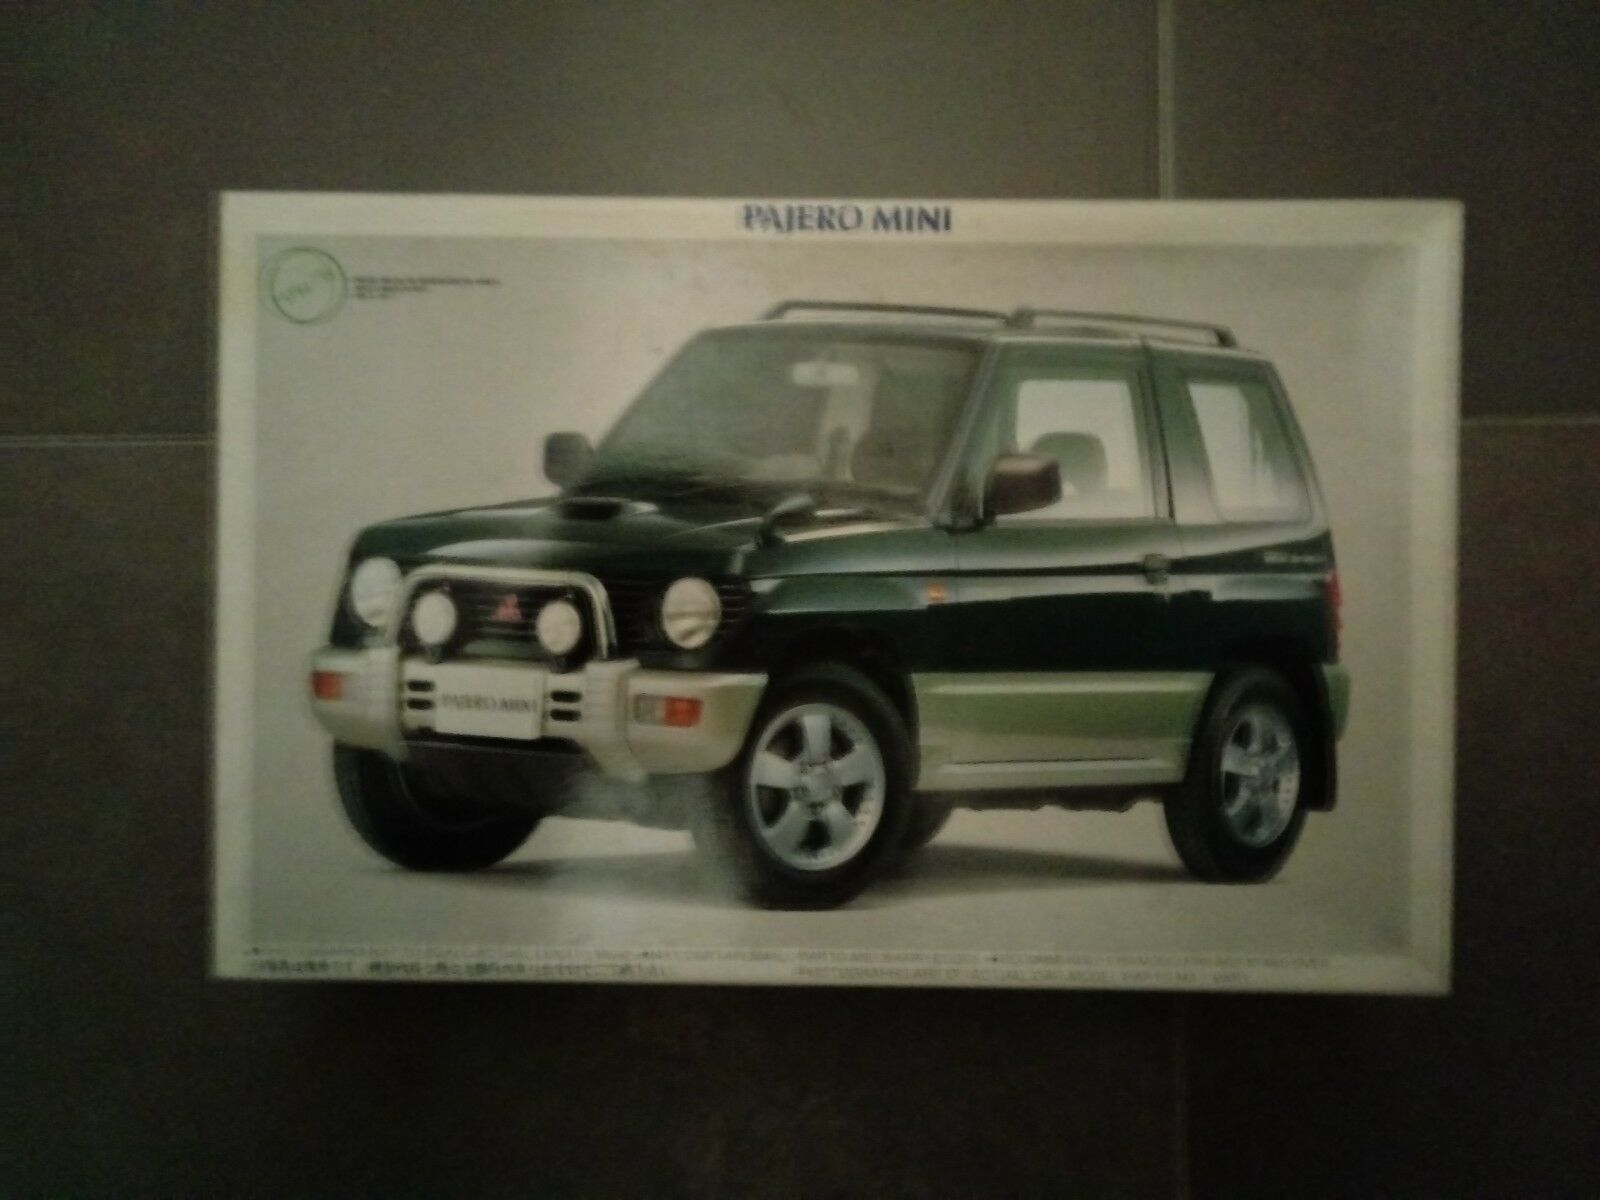 Kit de montaje Mitsubishi Pajero Escala1 24 Fujimi